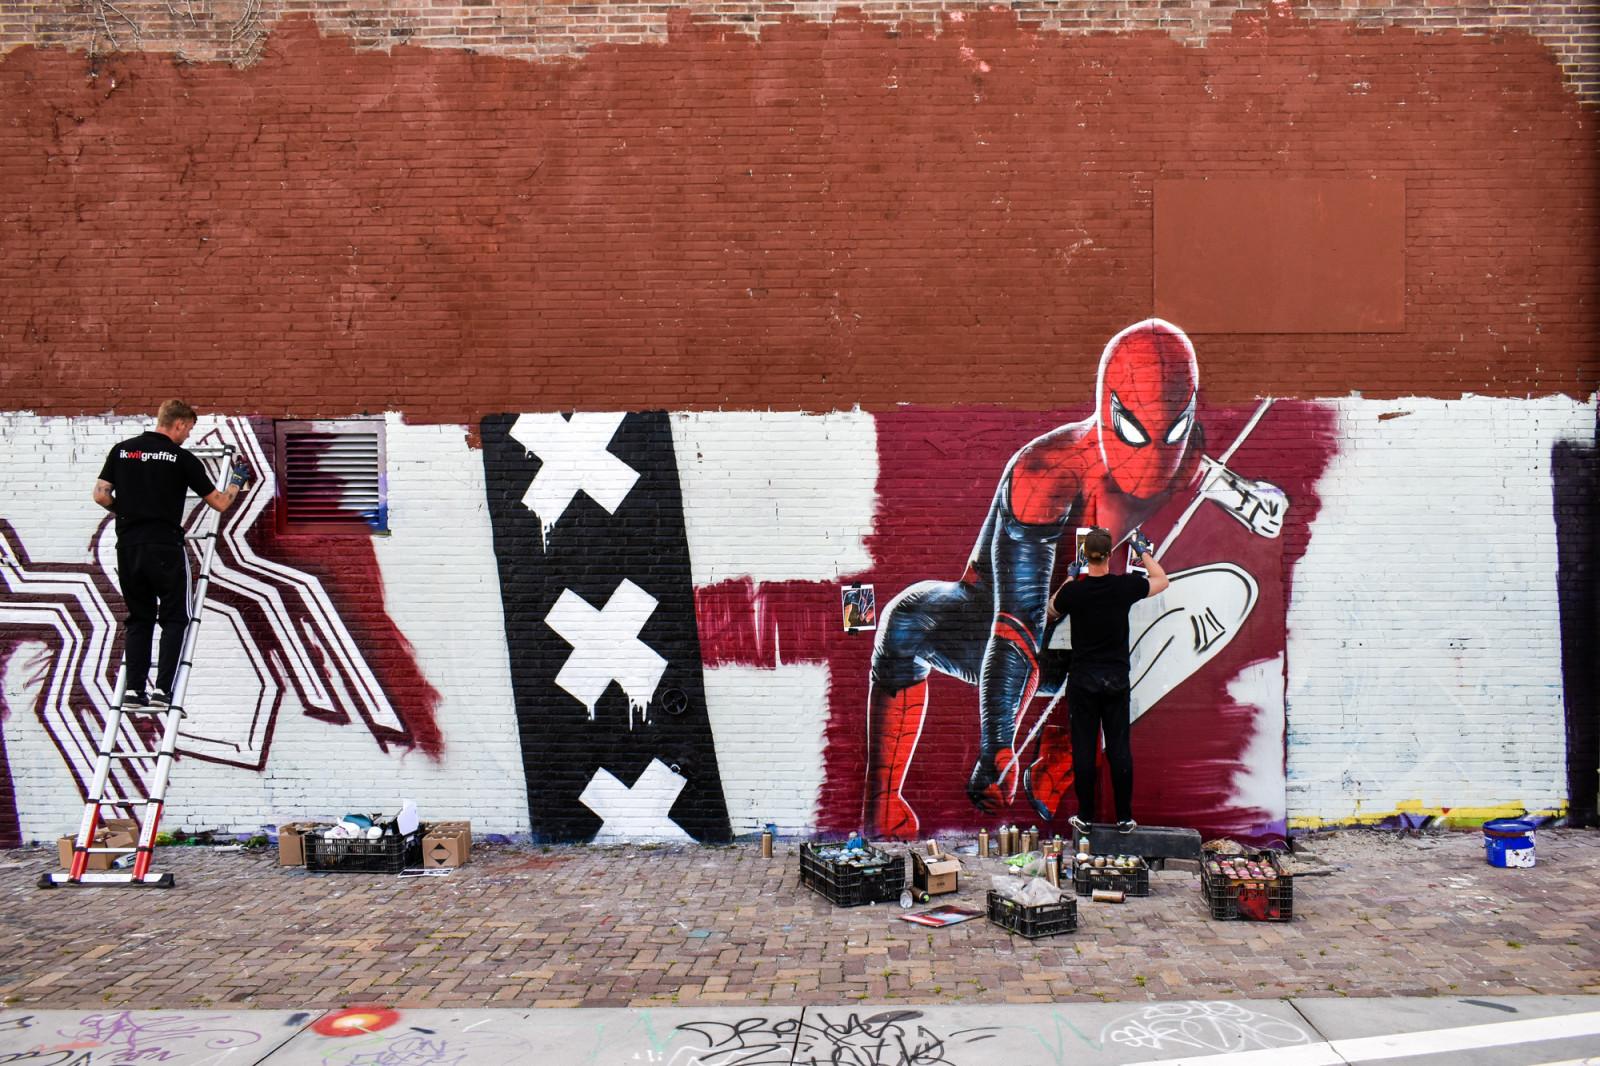 Graffiti artist painting in Amsterdam